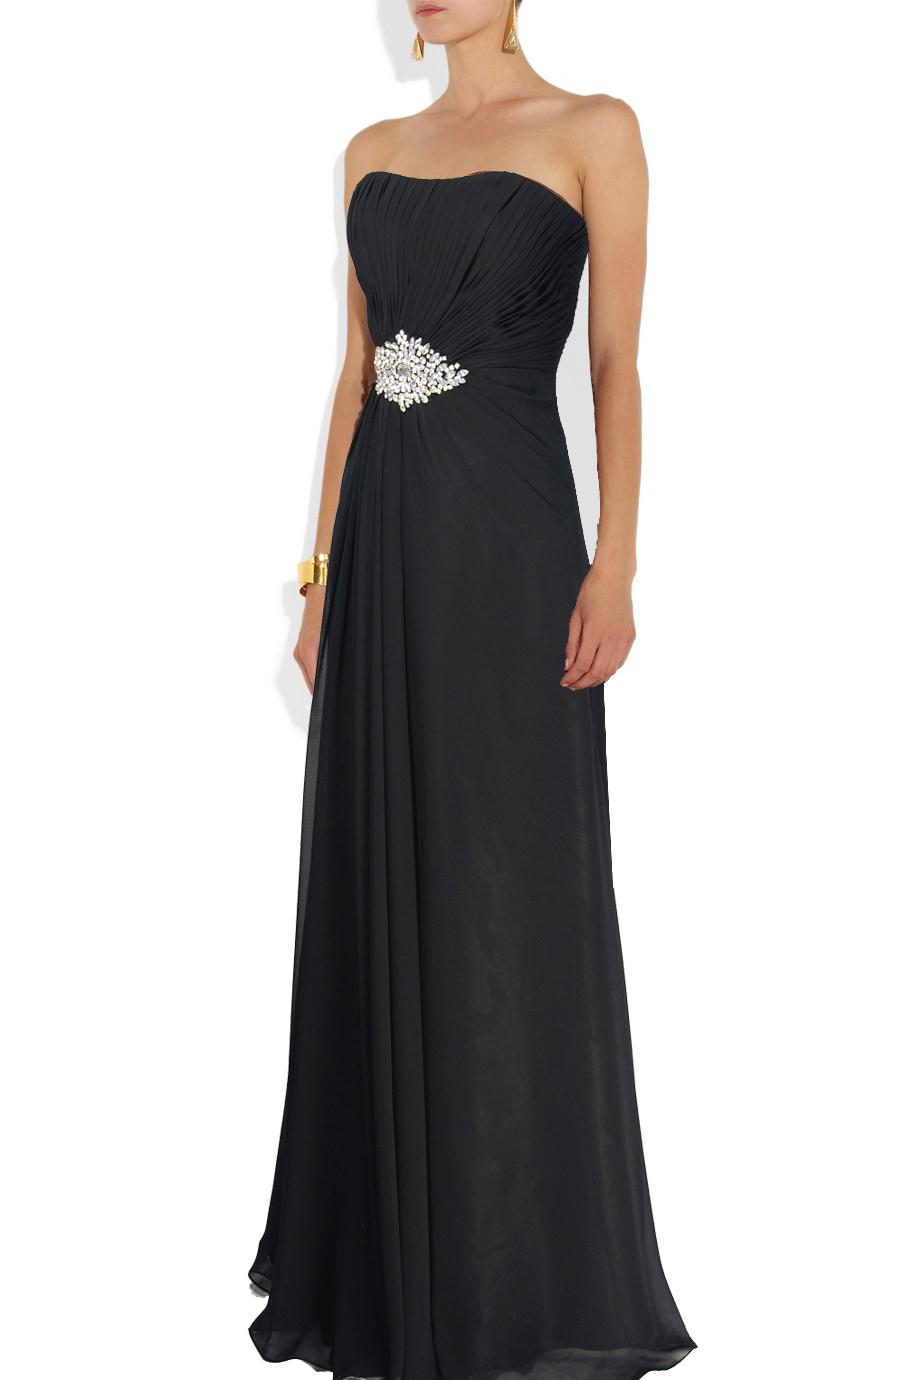 Elegant Formal Dresses Uk Things To Know Always Fashion